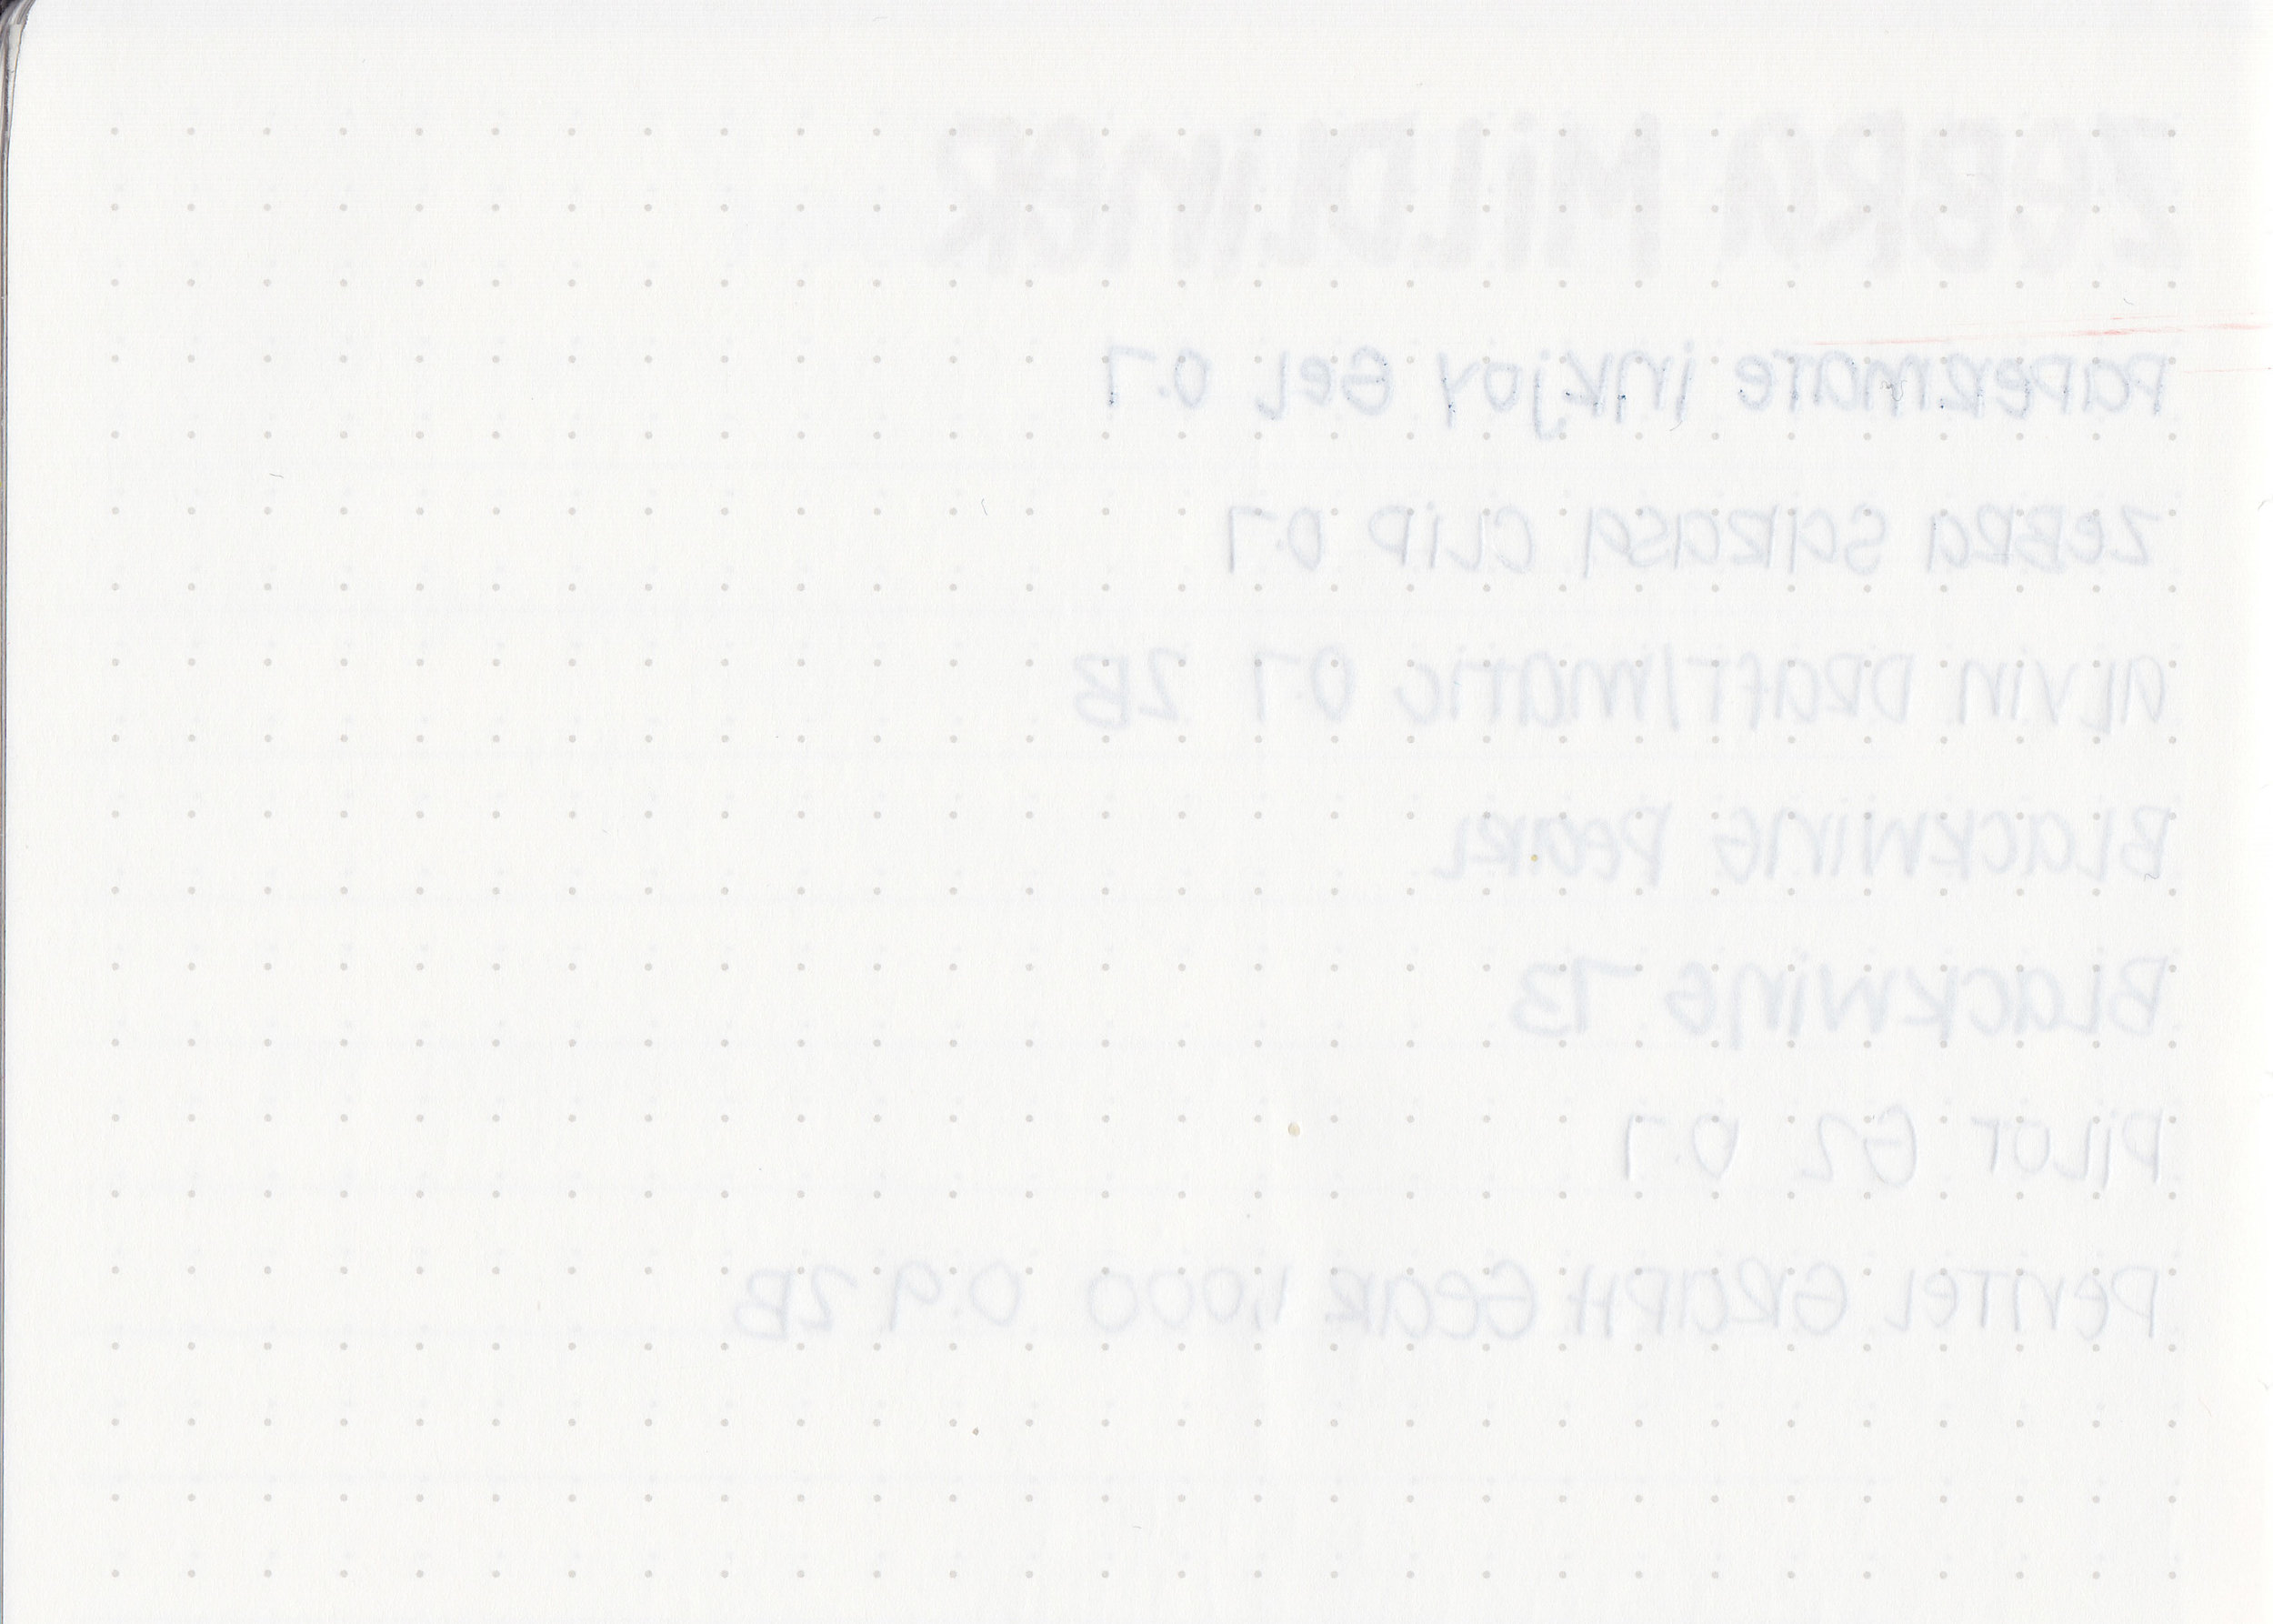 bond-a5-4.jpg